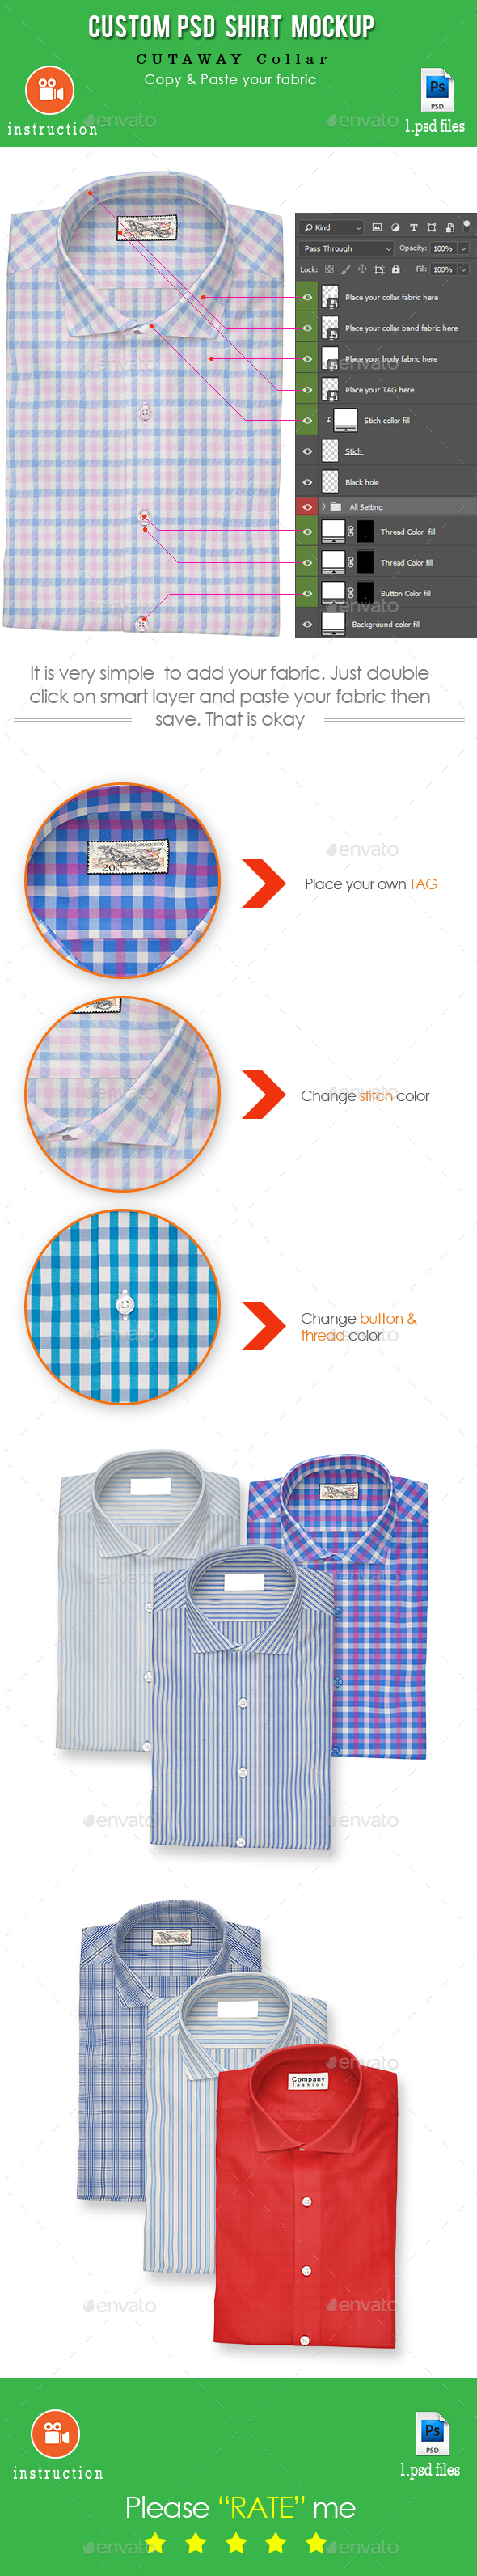 """Shirt Mockup (Cutaway Collar)"" - Apparel Product Mock-Ups"